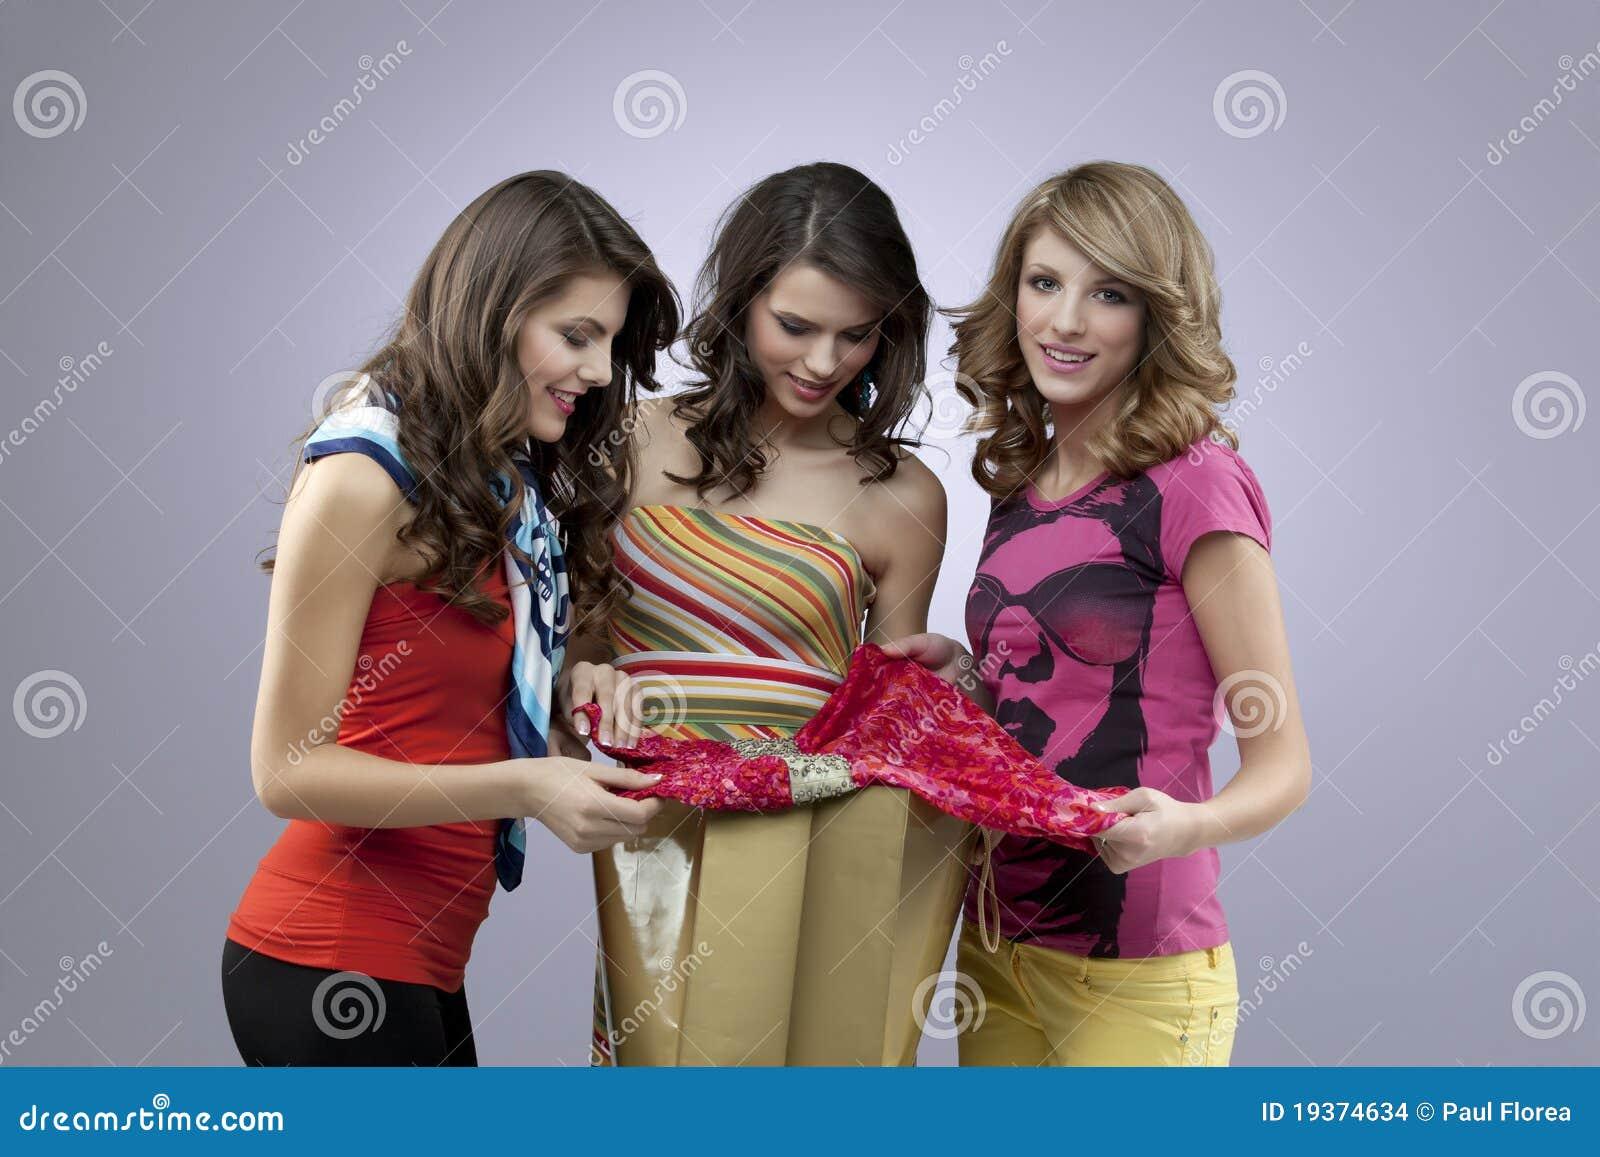 Compra bonita de três mulheres